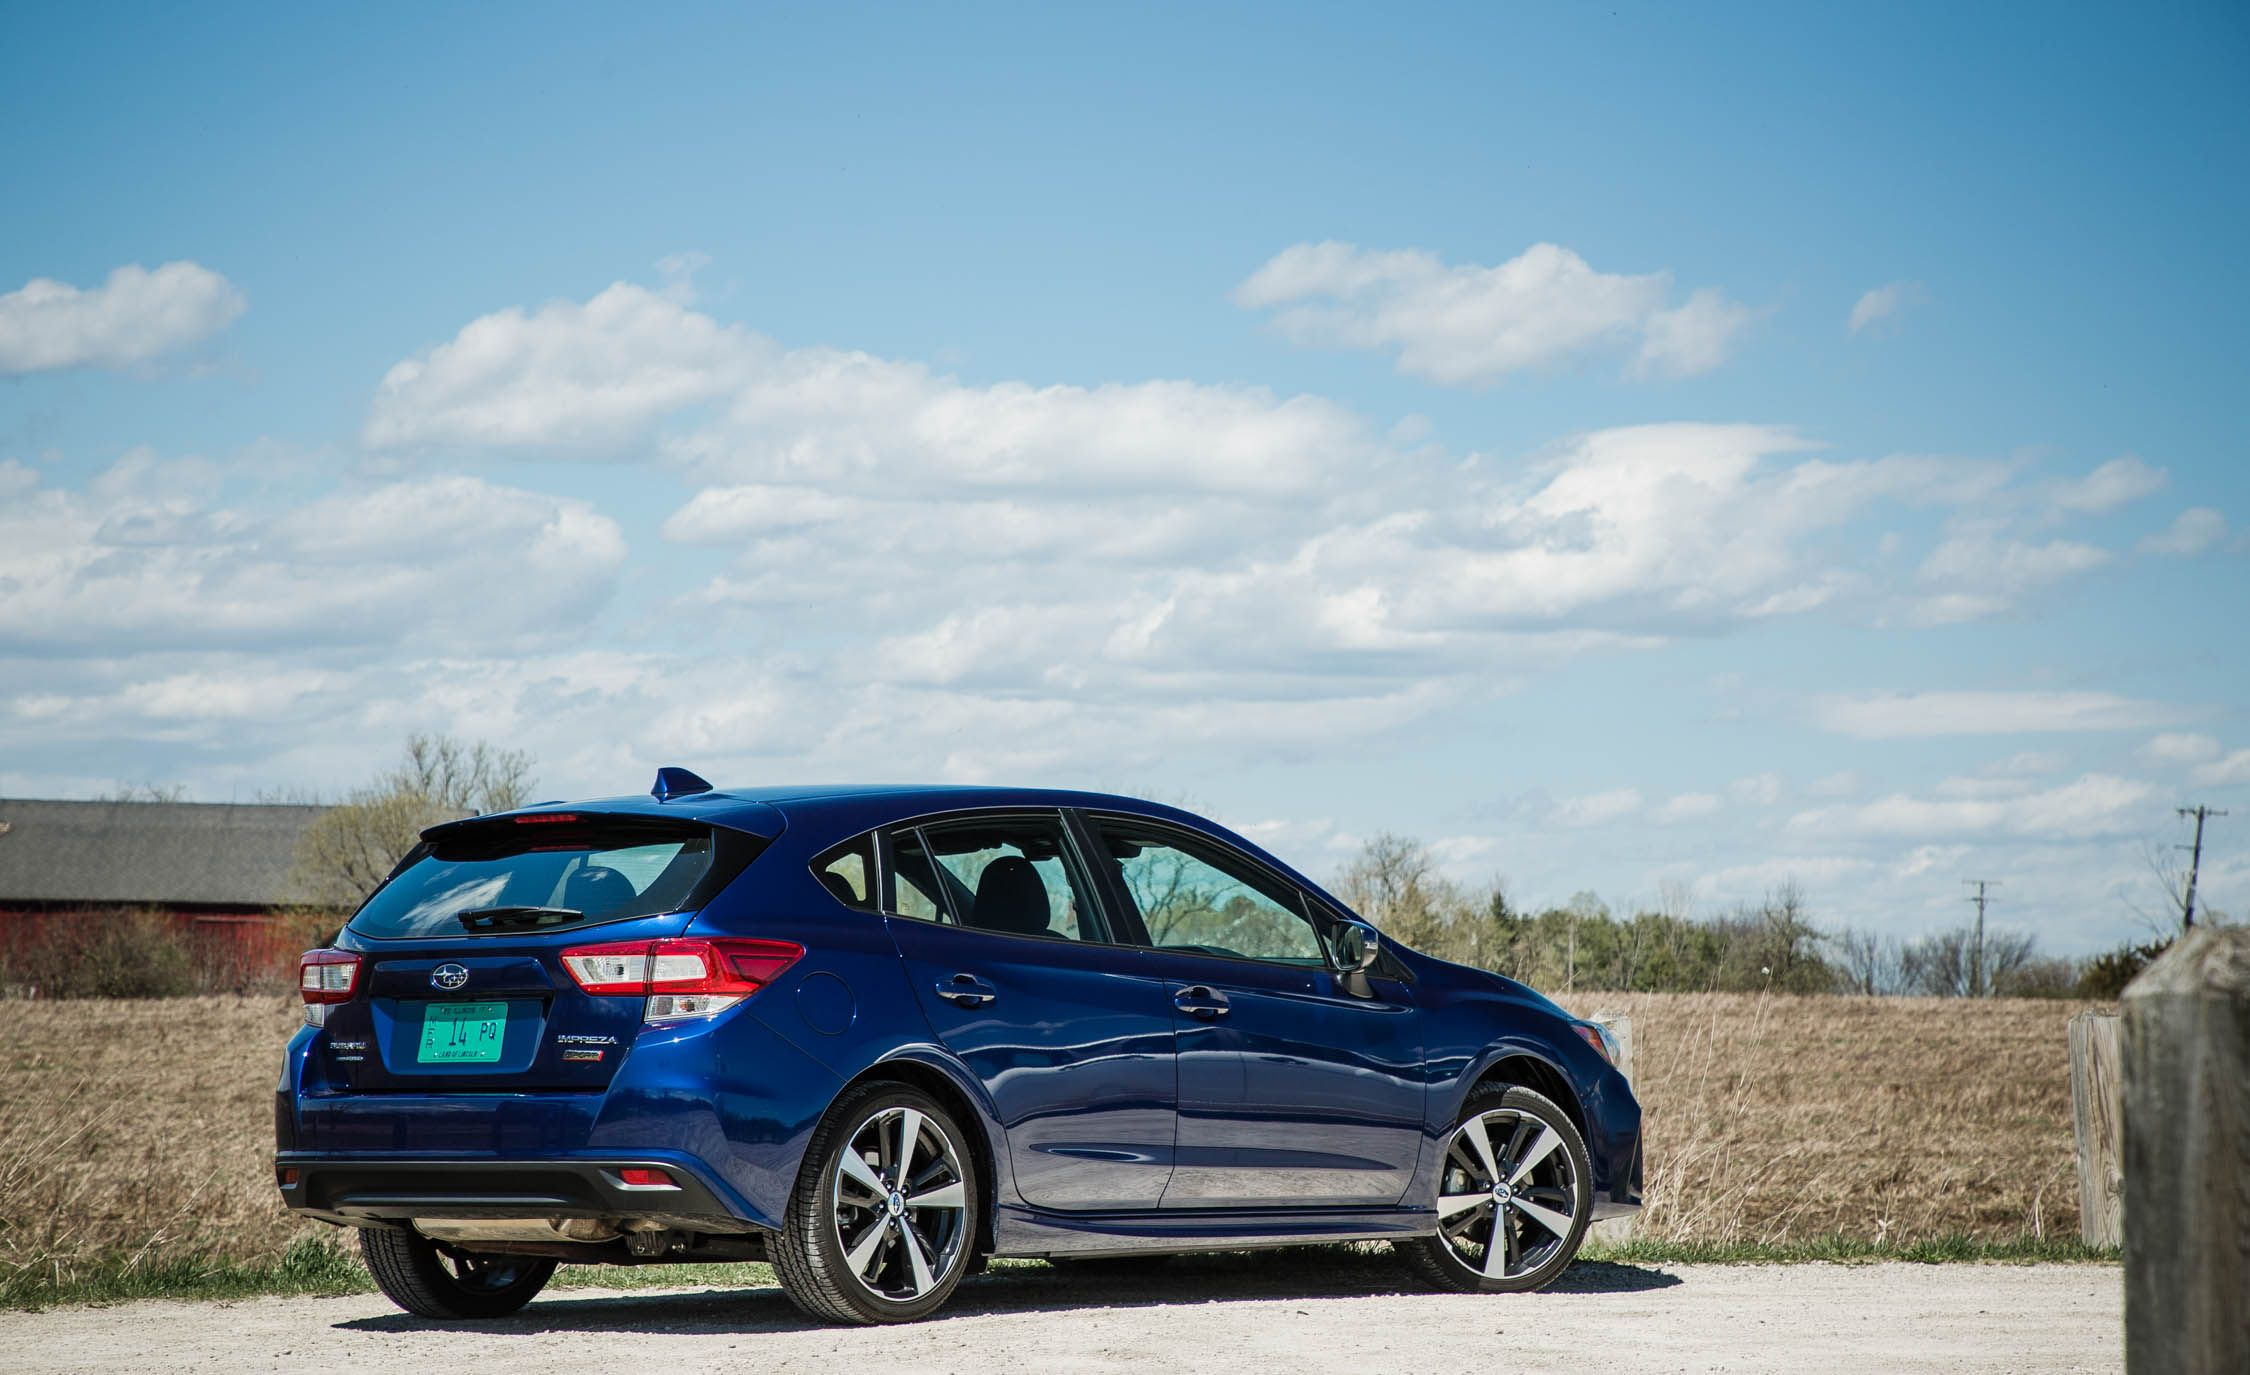 2017 Subaru Impreza | Cargo Space and Storage Review | Car and Driver